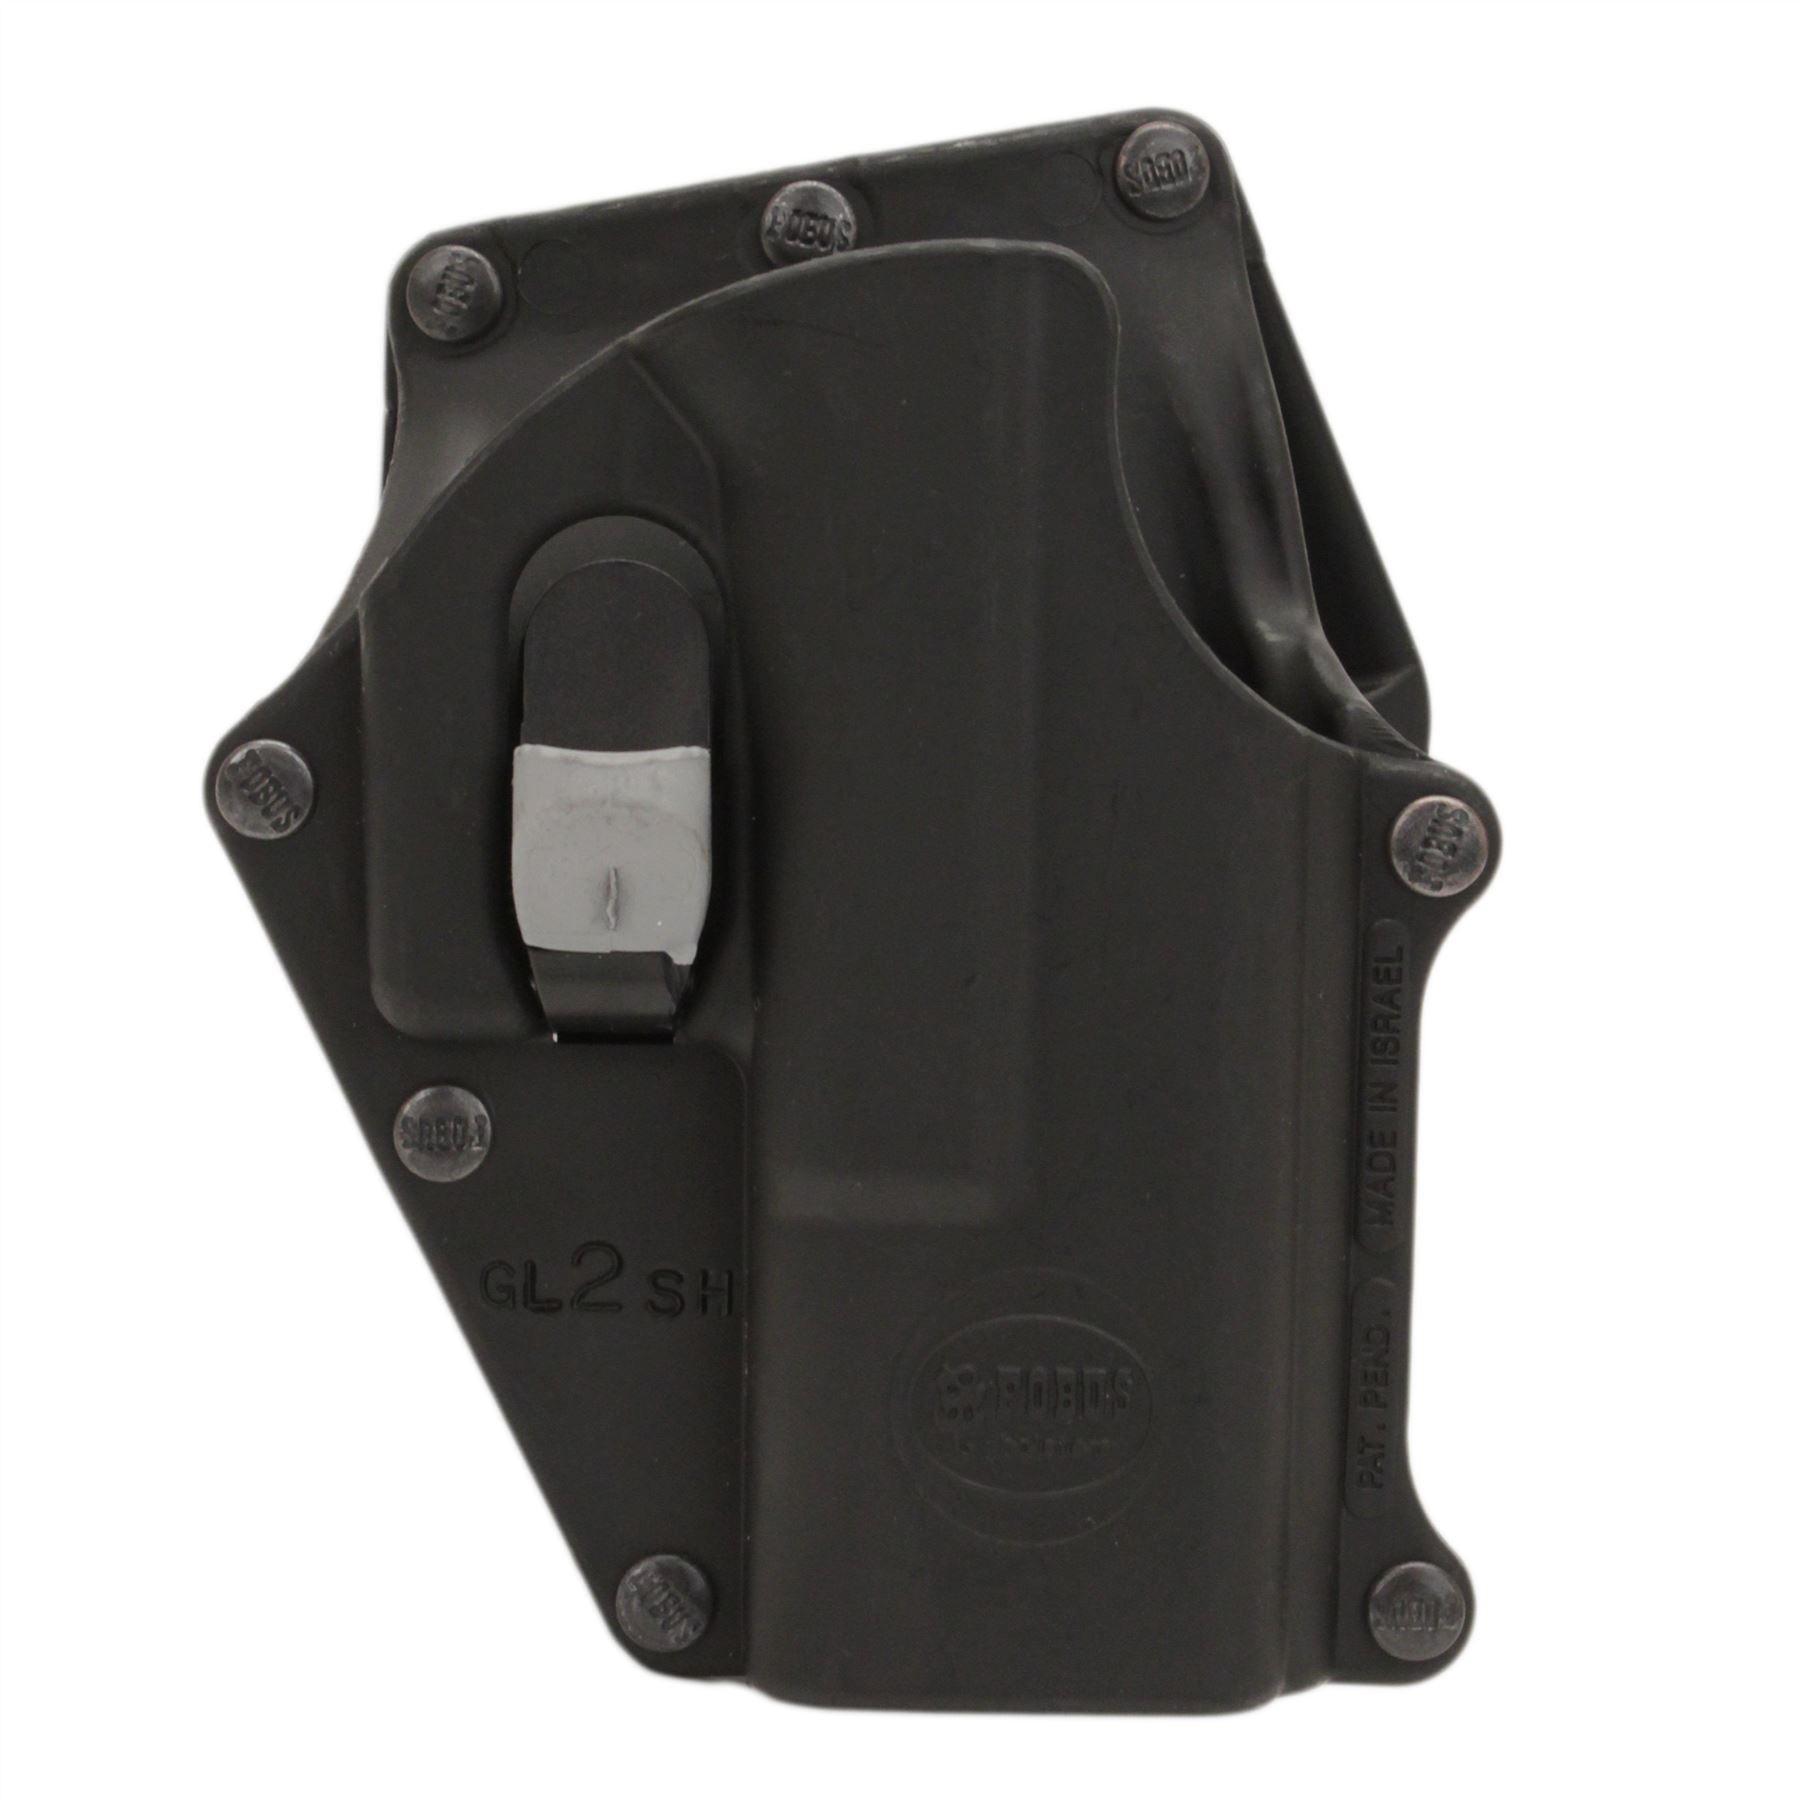 Fobus Glock 17 19 22 23 31 32 34 35 Belt by Fobus